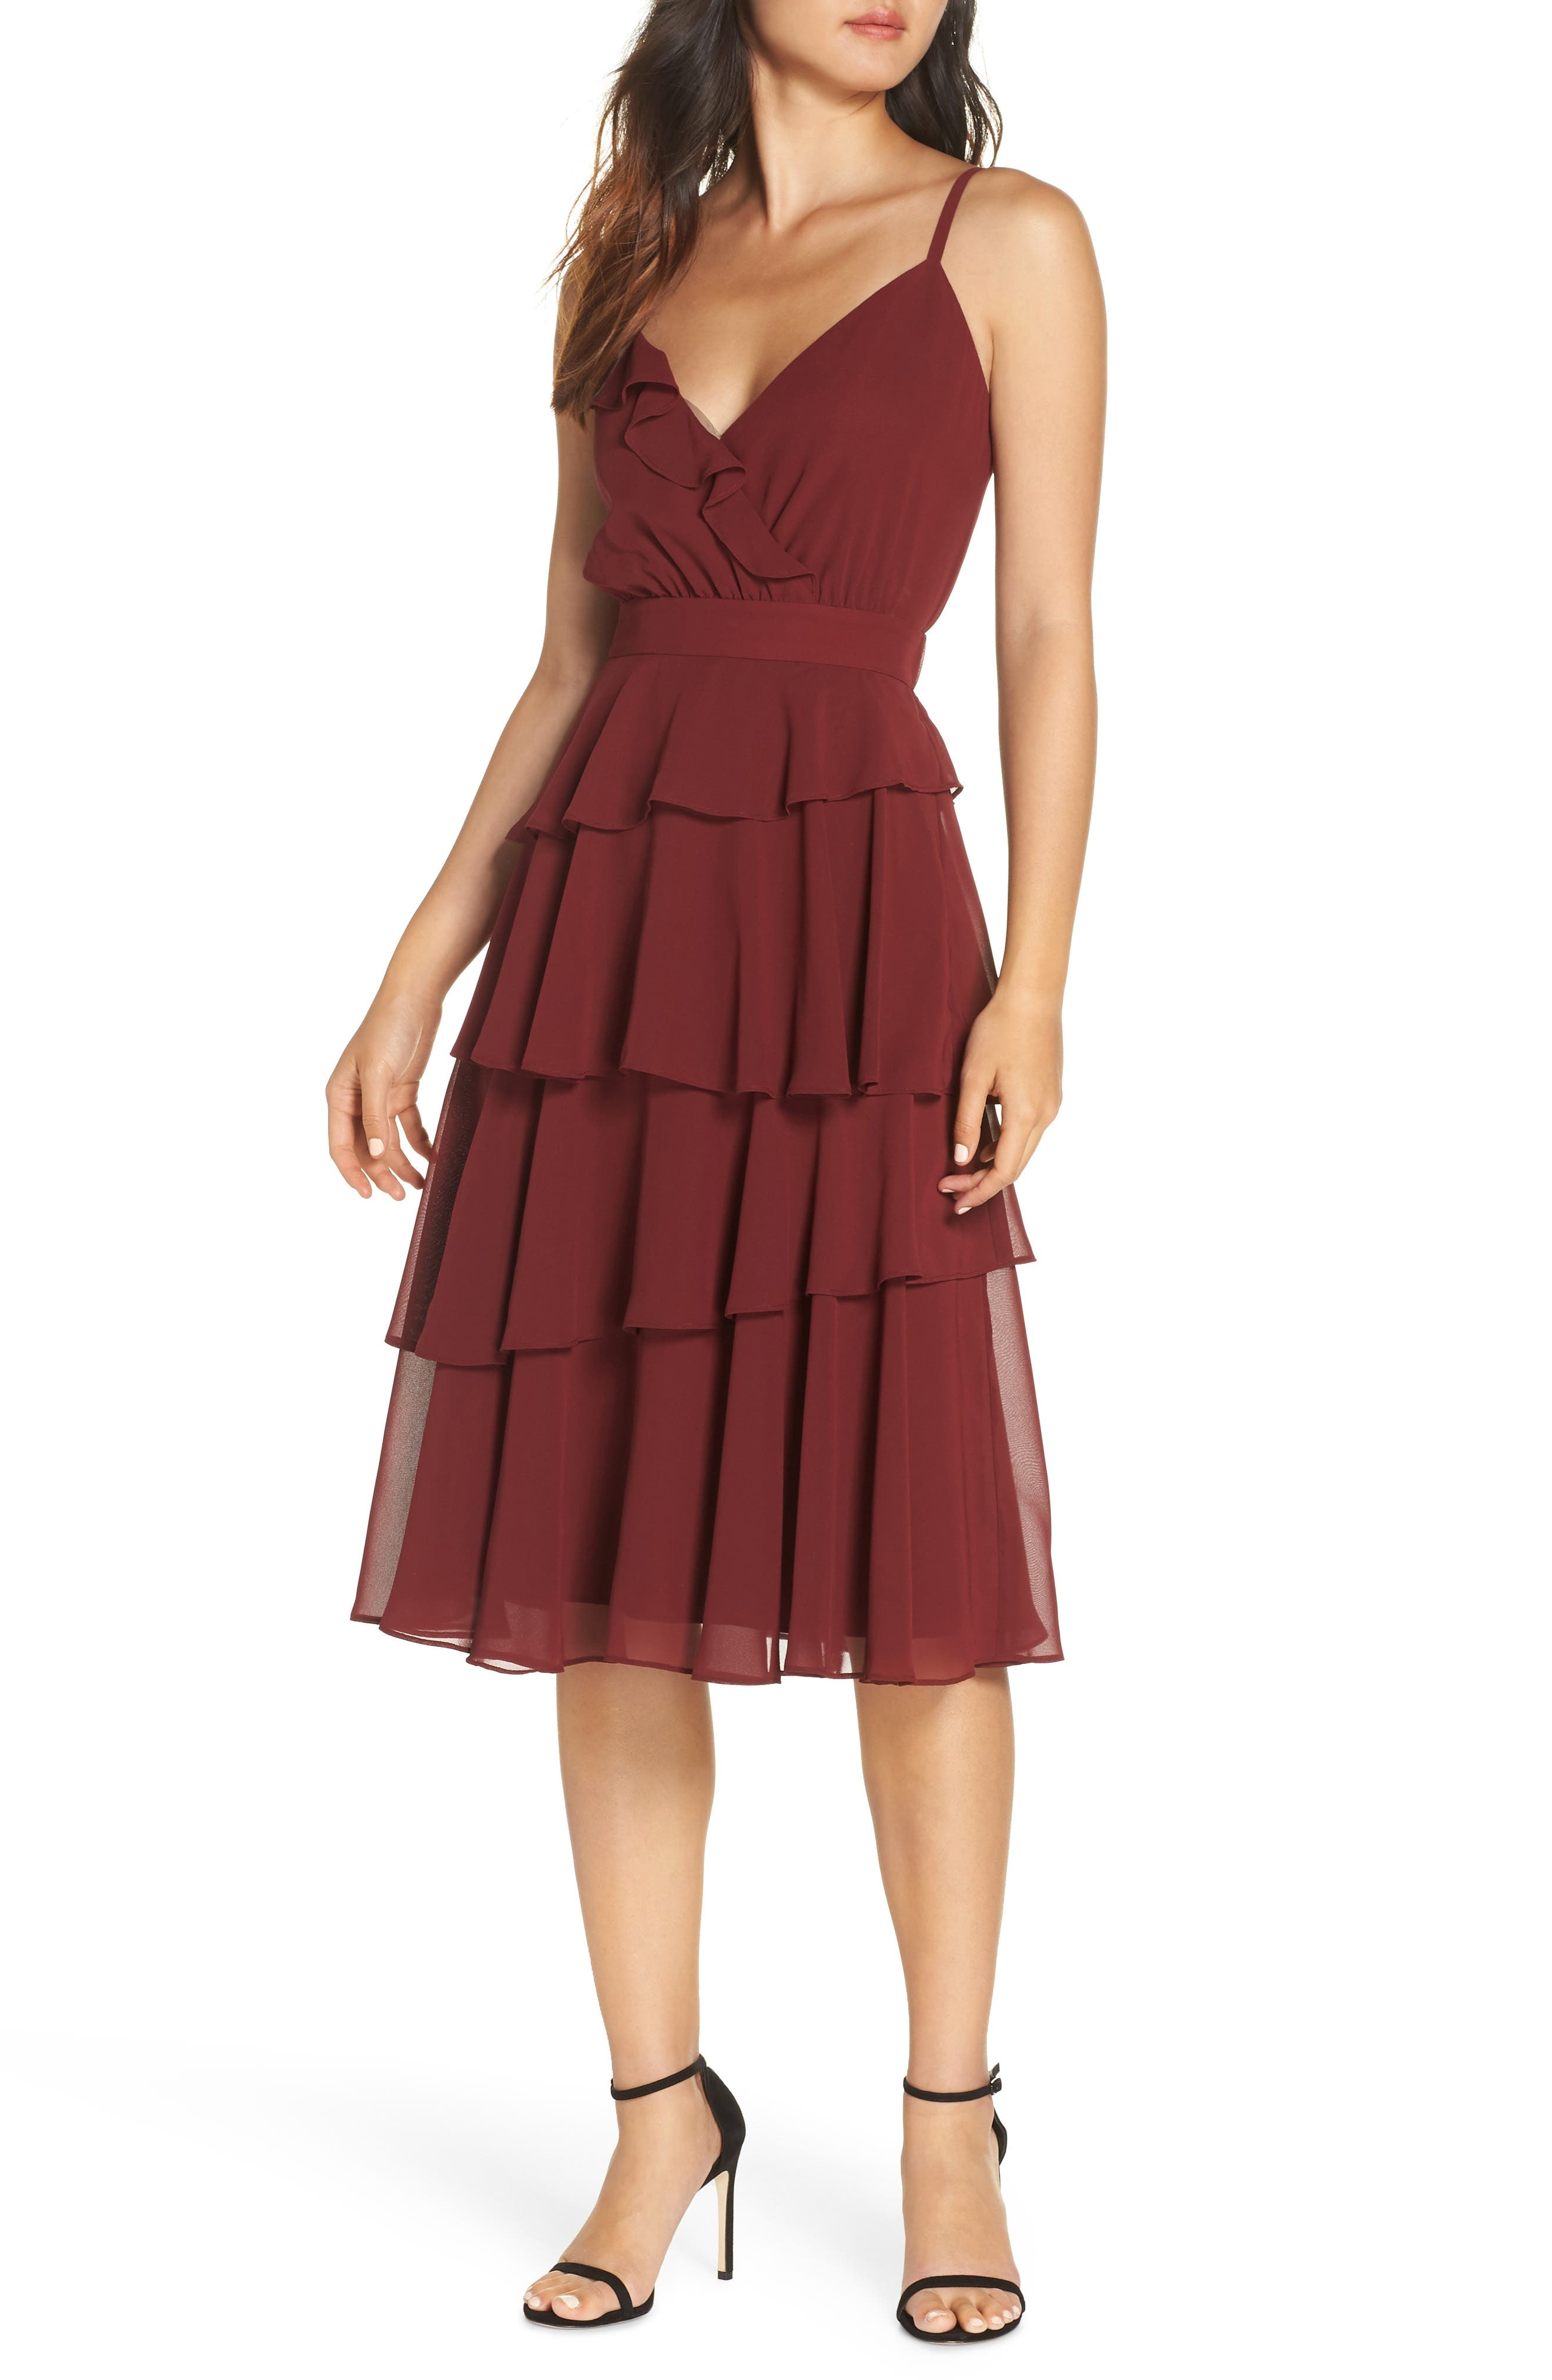 Ali & Jay Love Is All Around Ruffle Tiered Dress, Burgundy